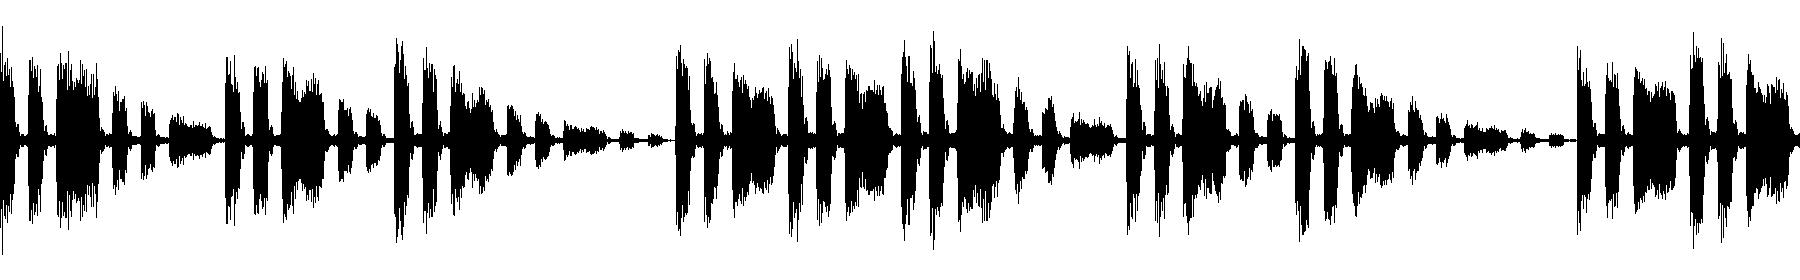 90 c 11